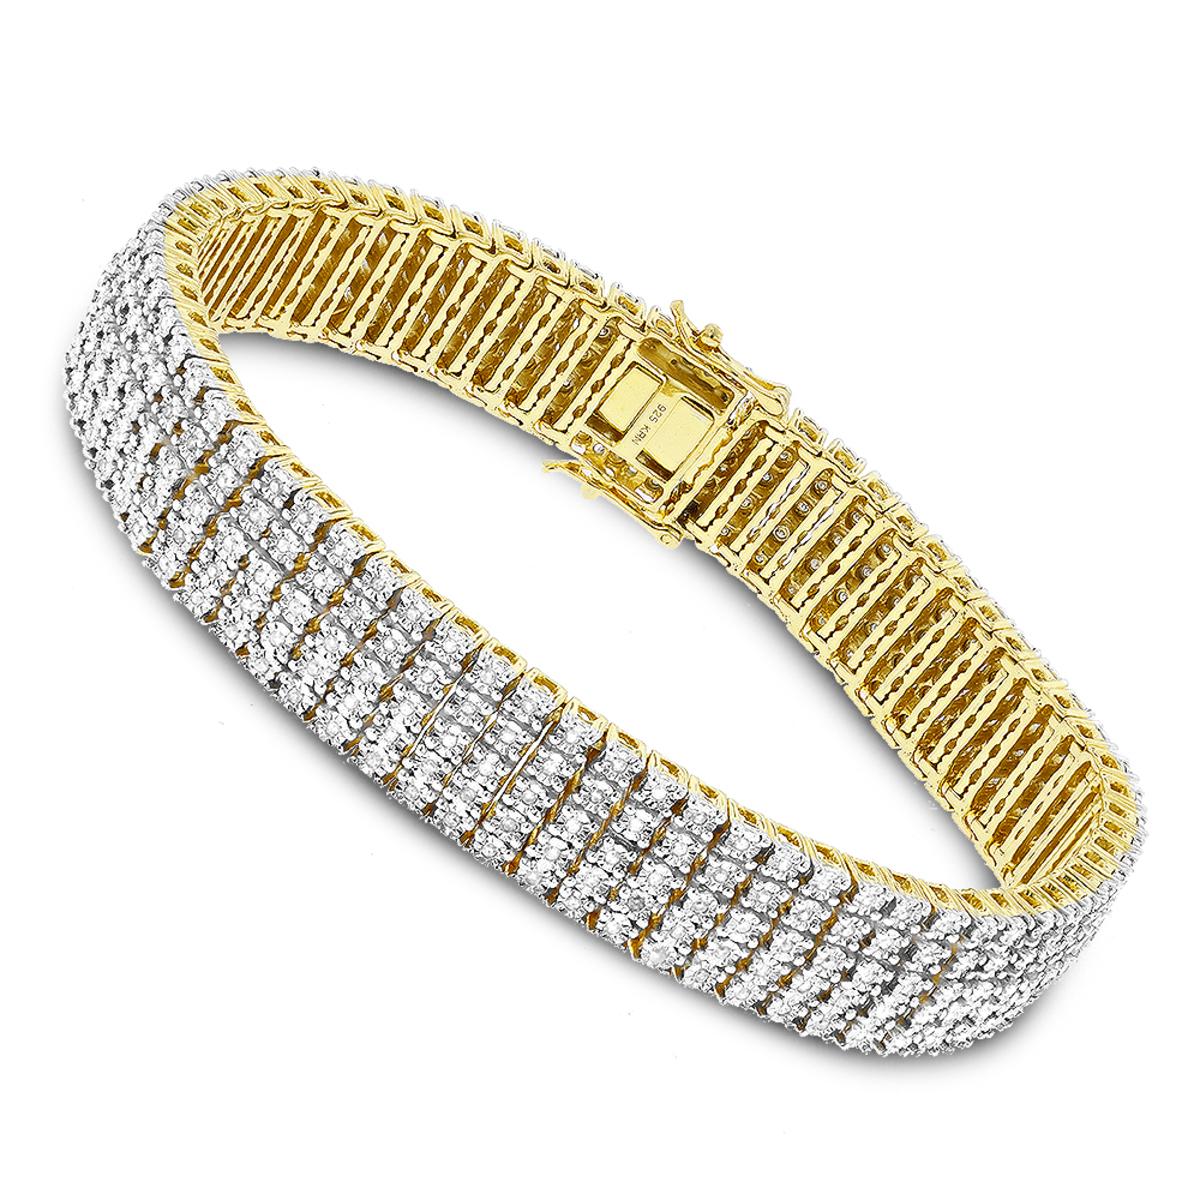 Mens Bracelets: Sterling Silver 5 Row Diamond Bracelet 1.5ct Gold Plated